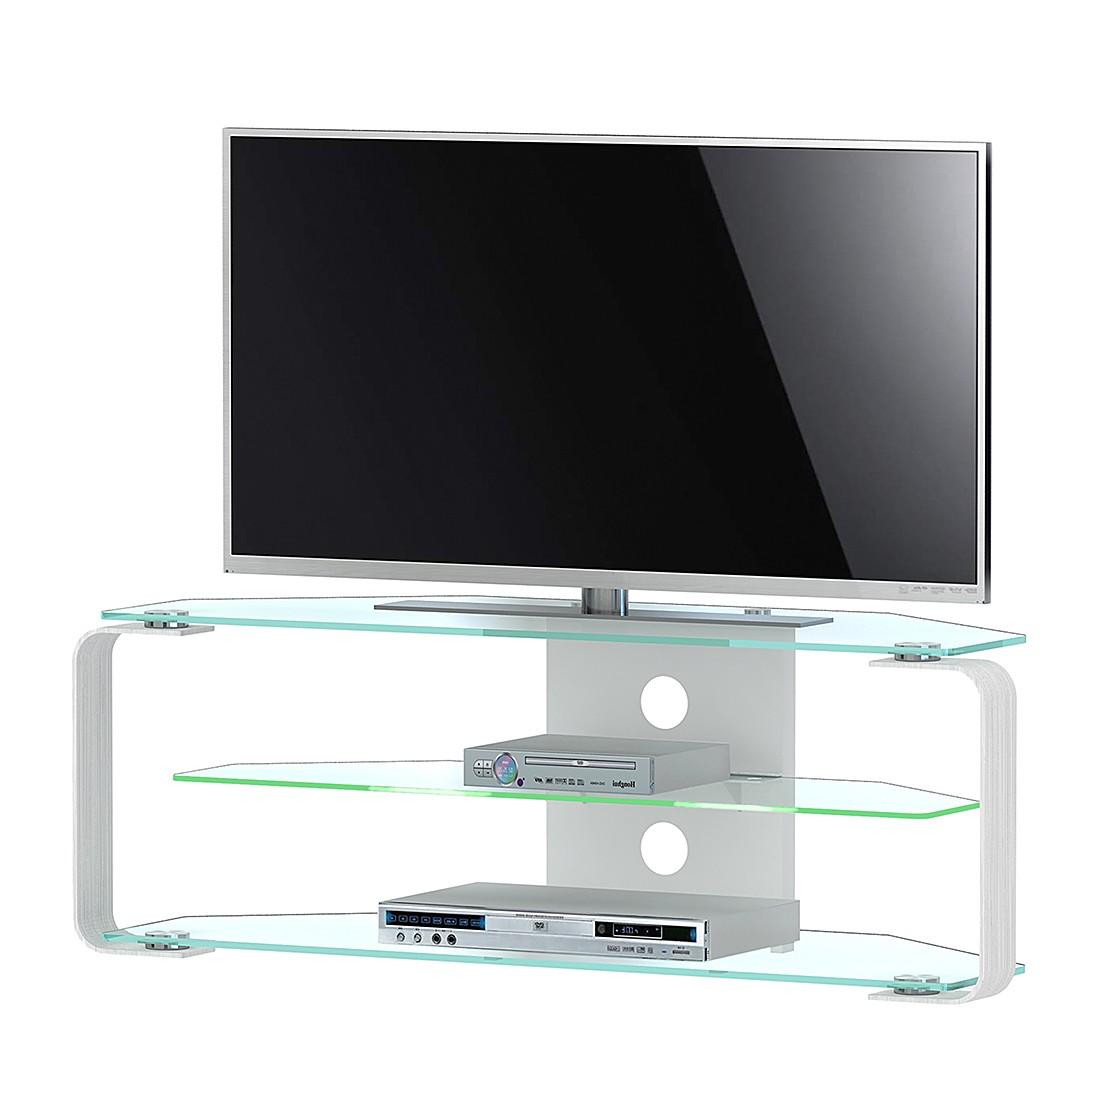 EEK A+, Meuble TV CU- MR (éclairage fourni) - Aluminium / Verre - 110 cm, Jahnke